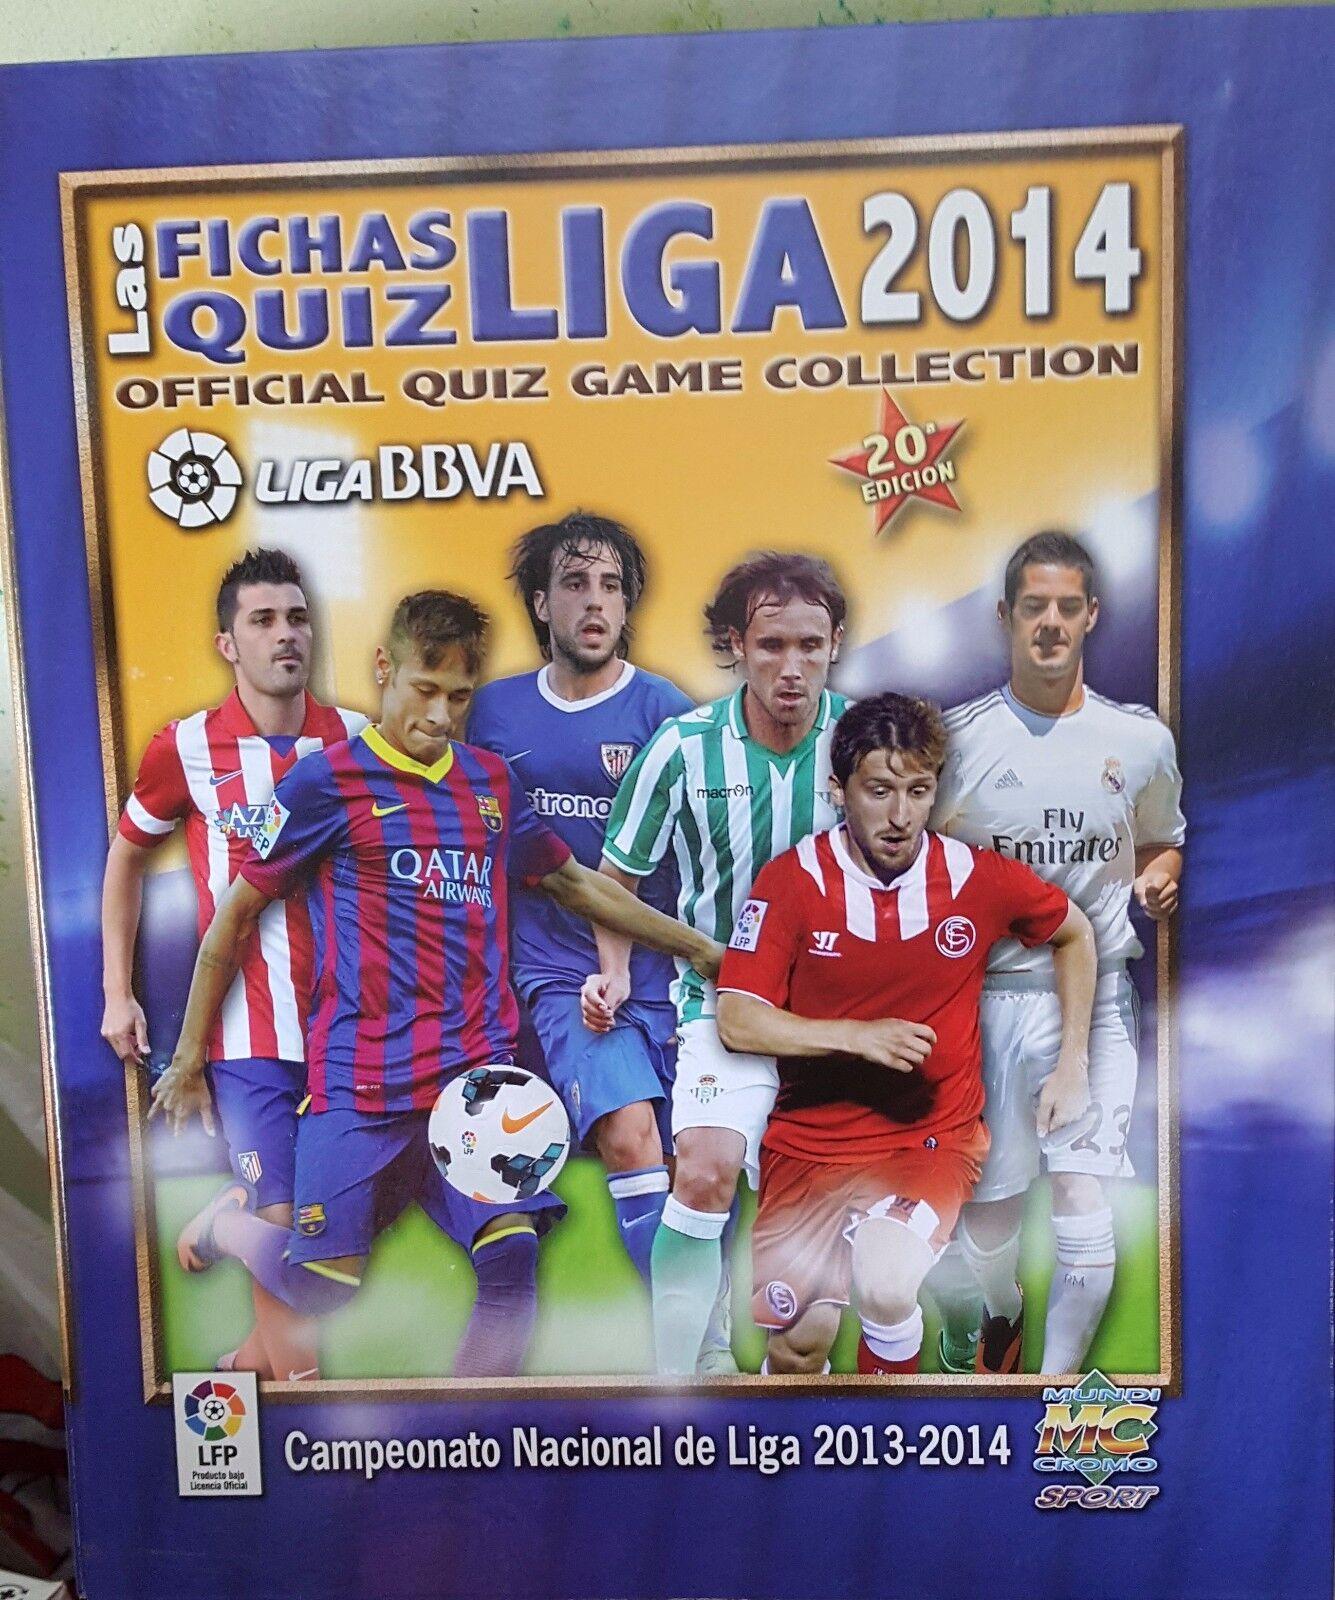 Las fichas Quiz de la Liga 2014 - Album completo